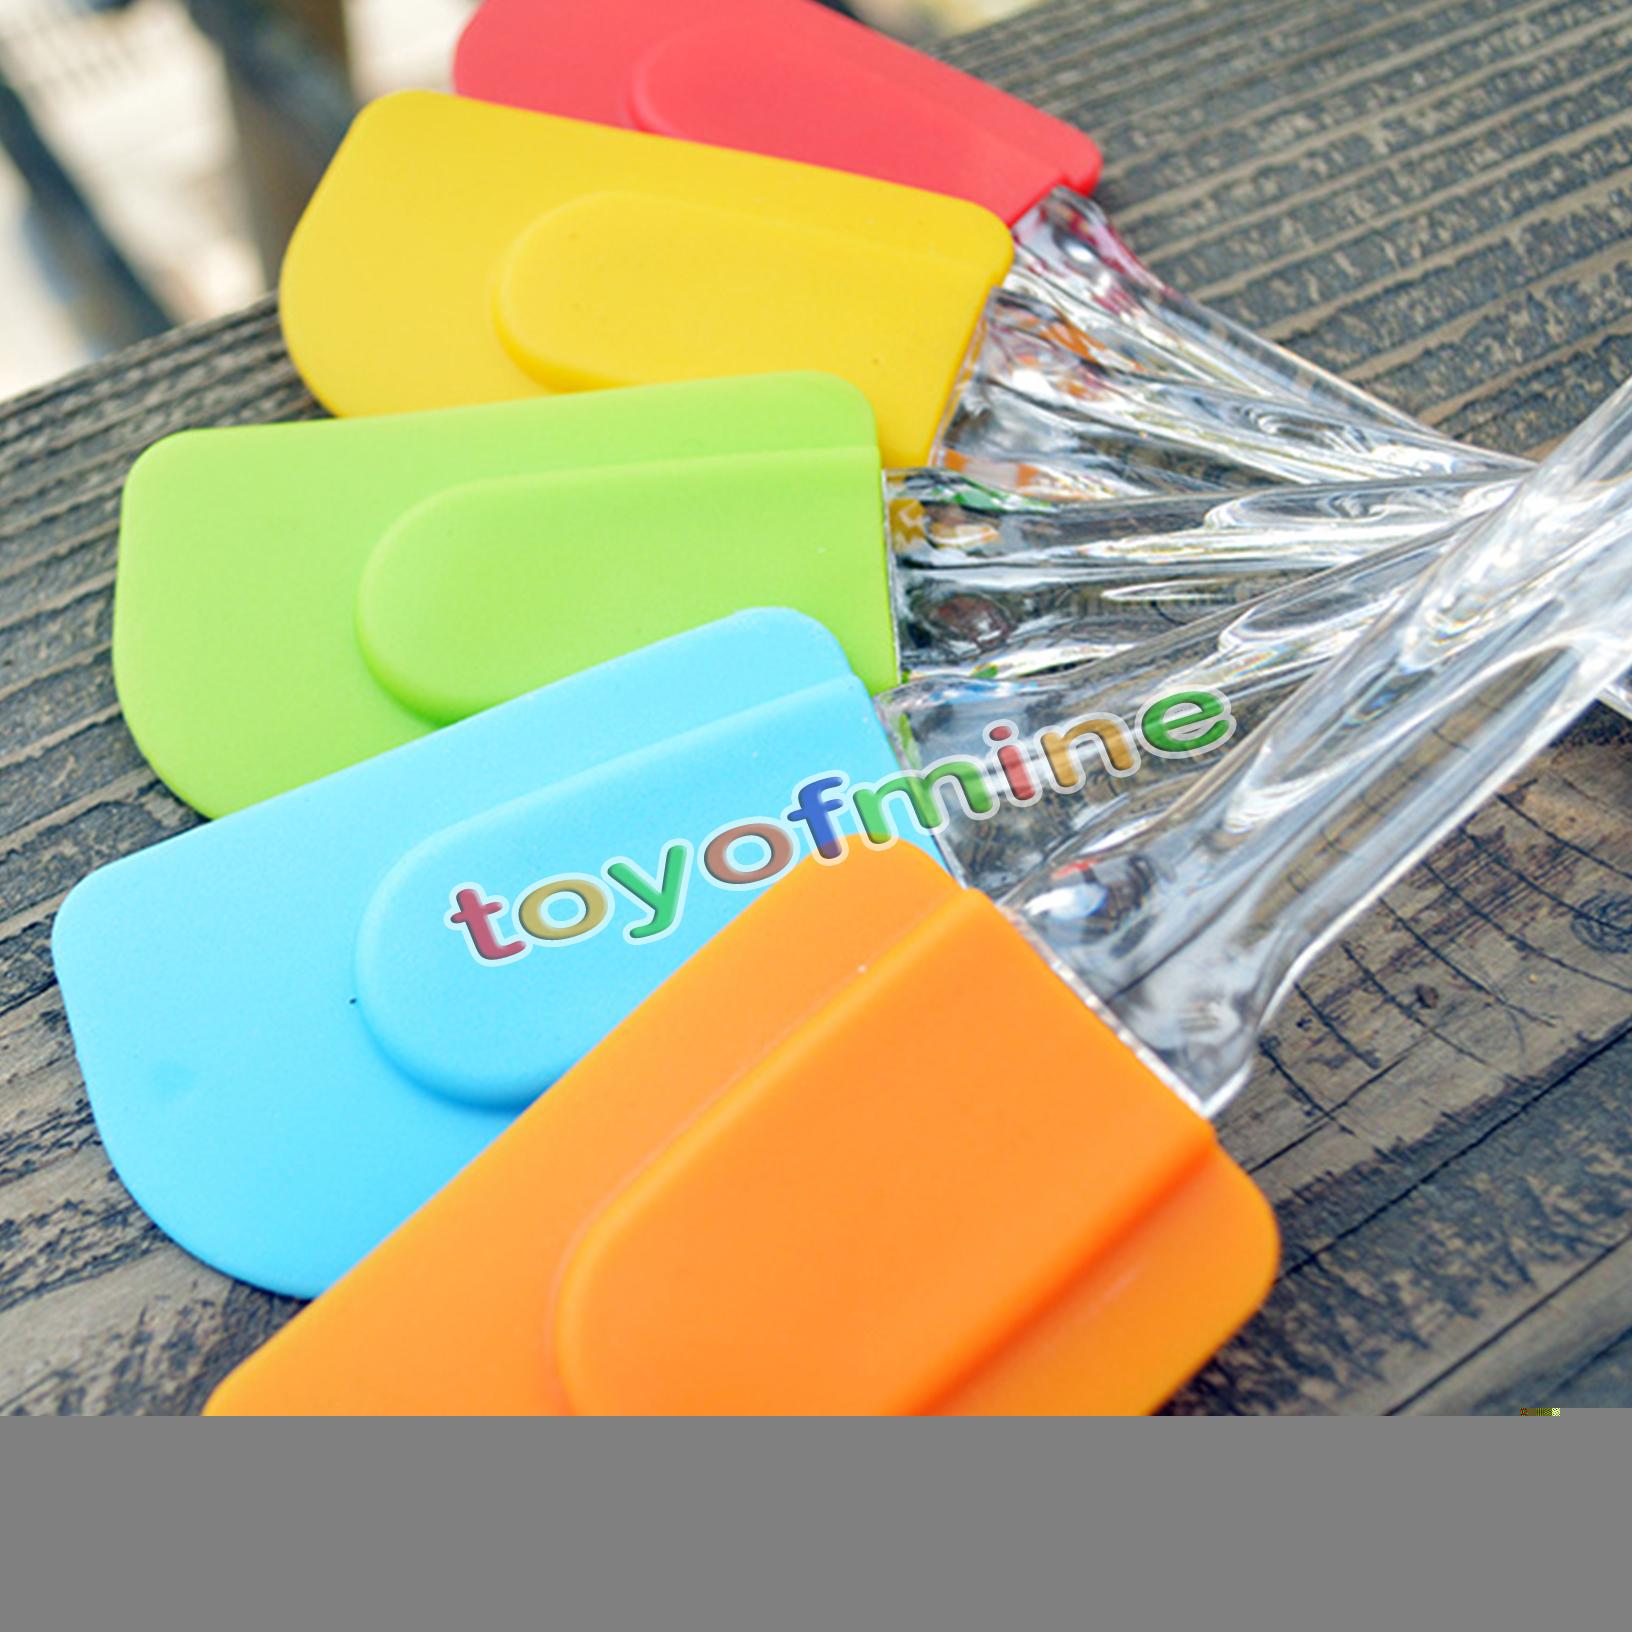 La cuisine cuisson scraper carepac silicone spatule - Spatule plastique cuisine ...